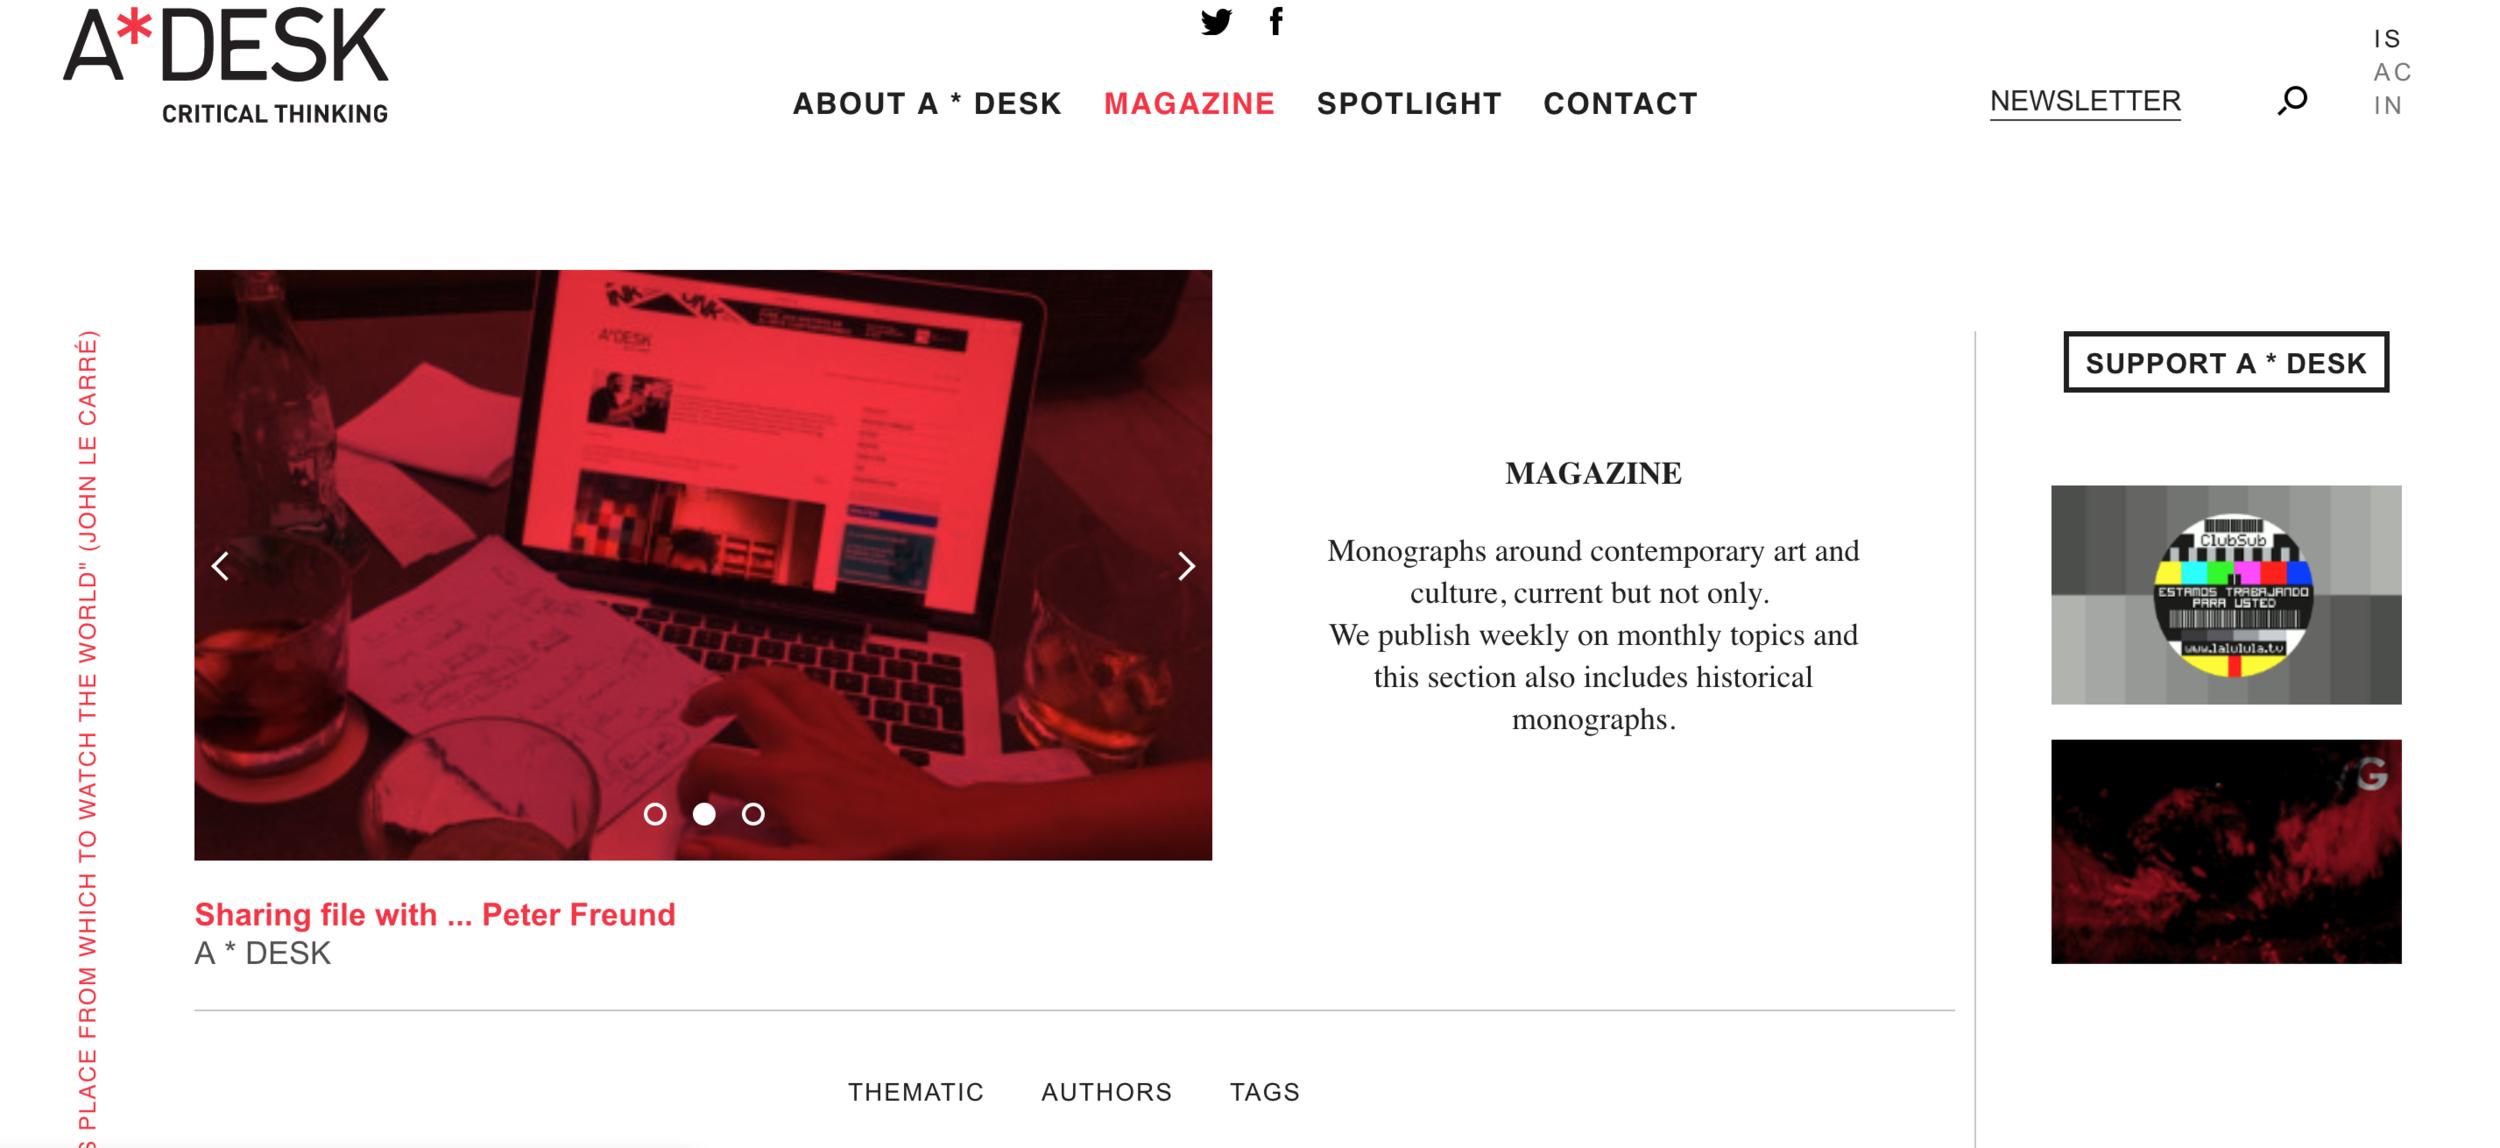 A*DESK website landing page (Magazine, 26 August 2019):  https://a-desk.org